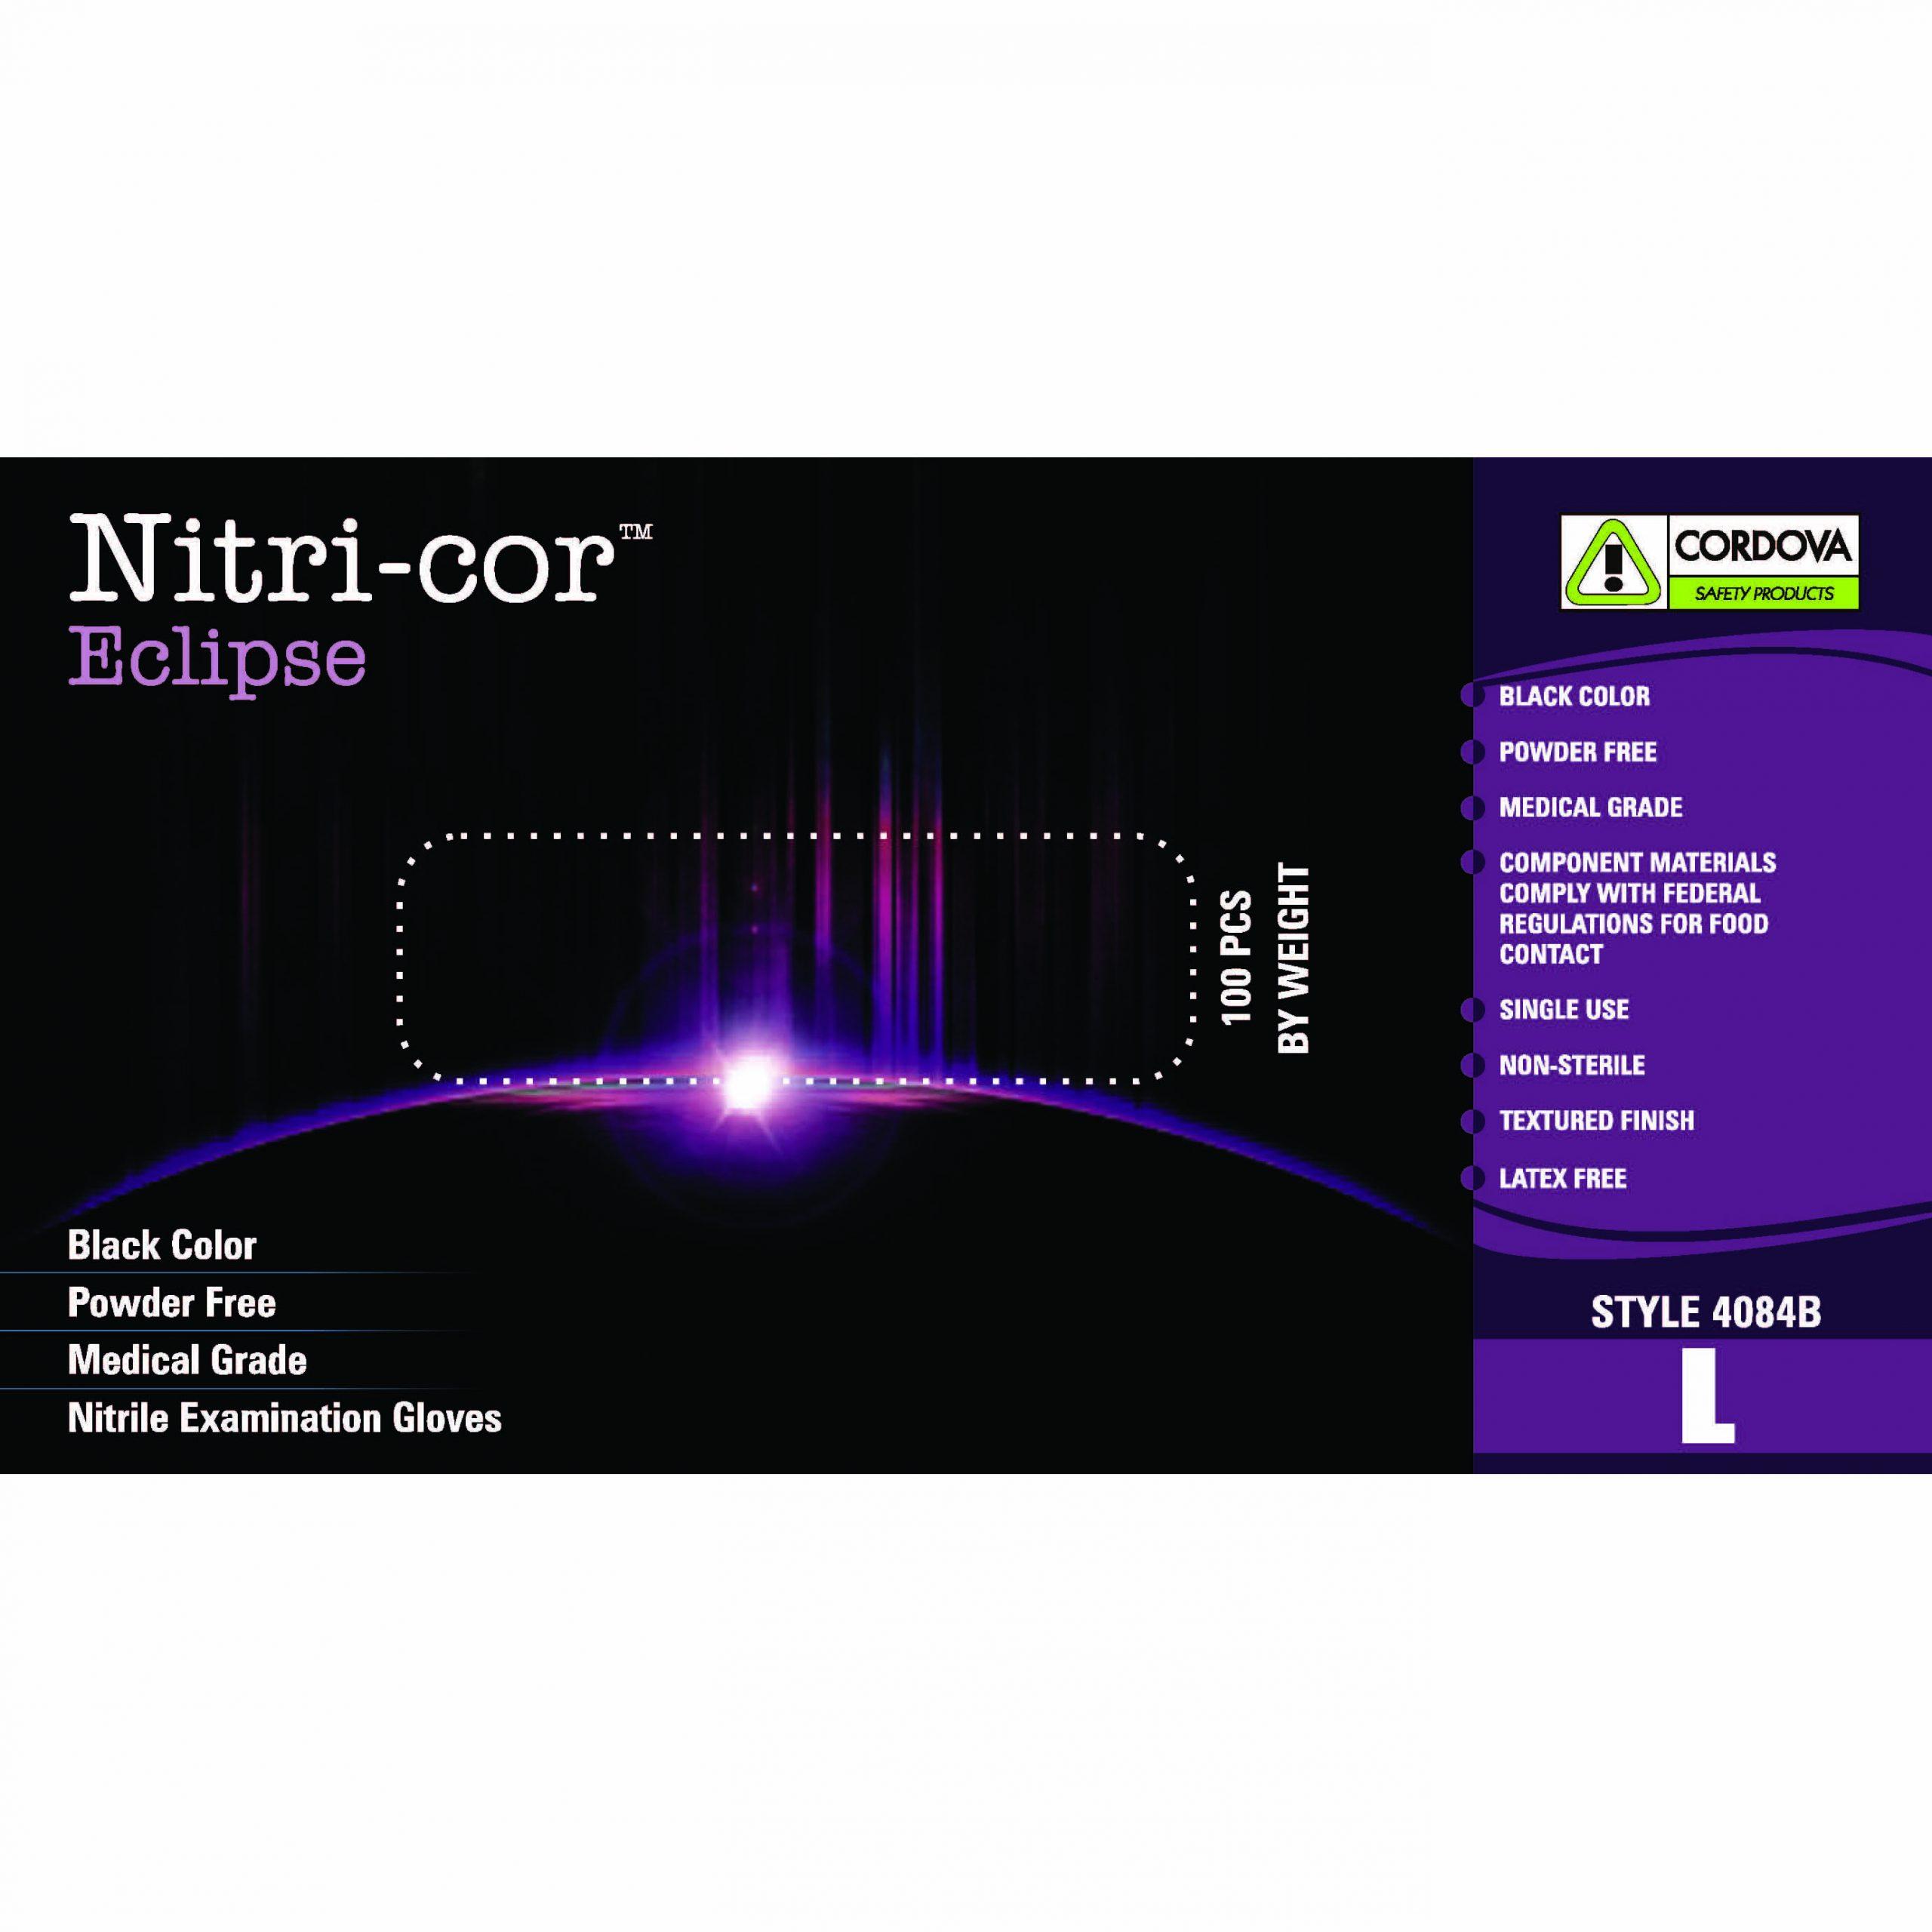 Nitri-Cor Eclipse 4084b